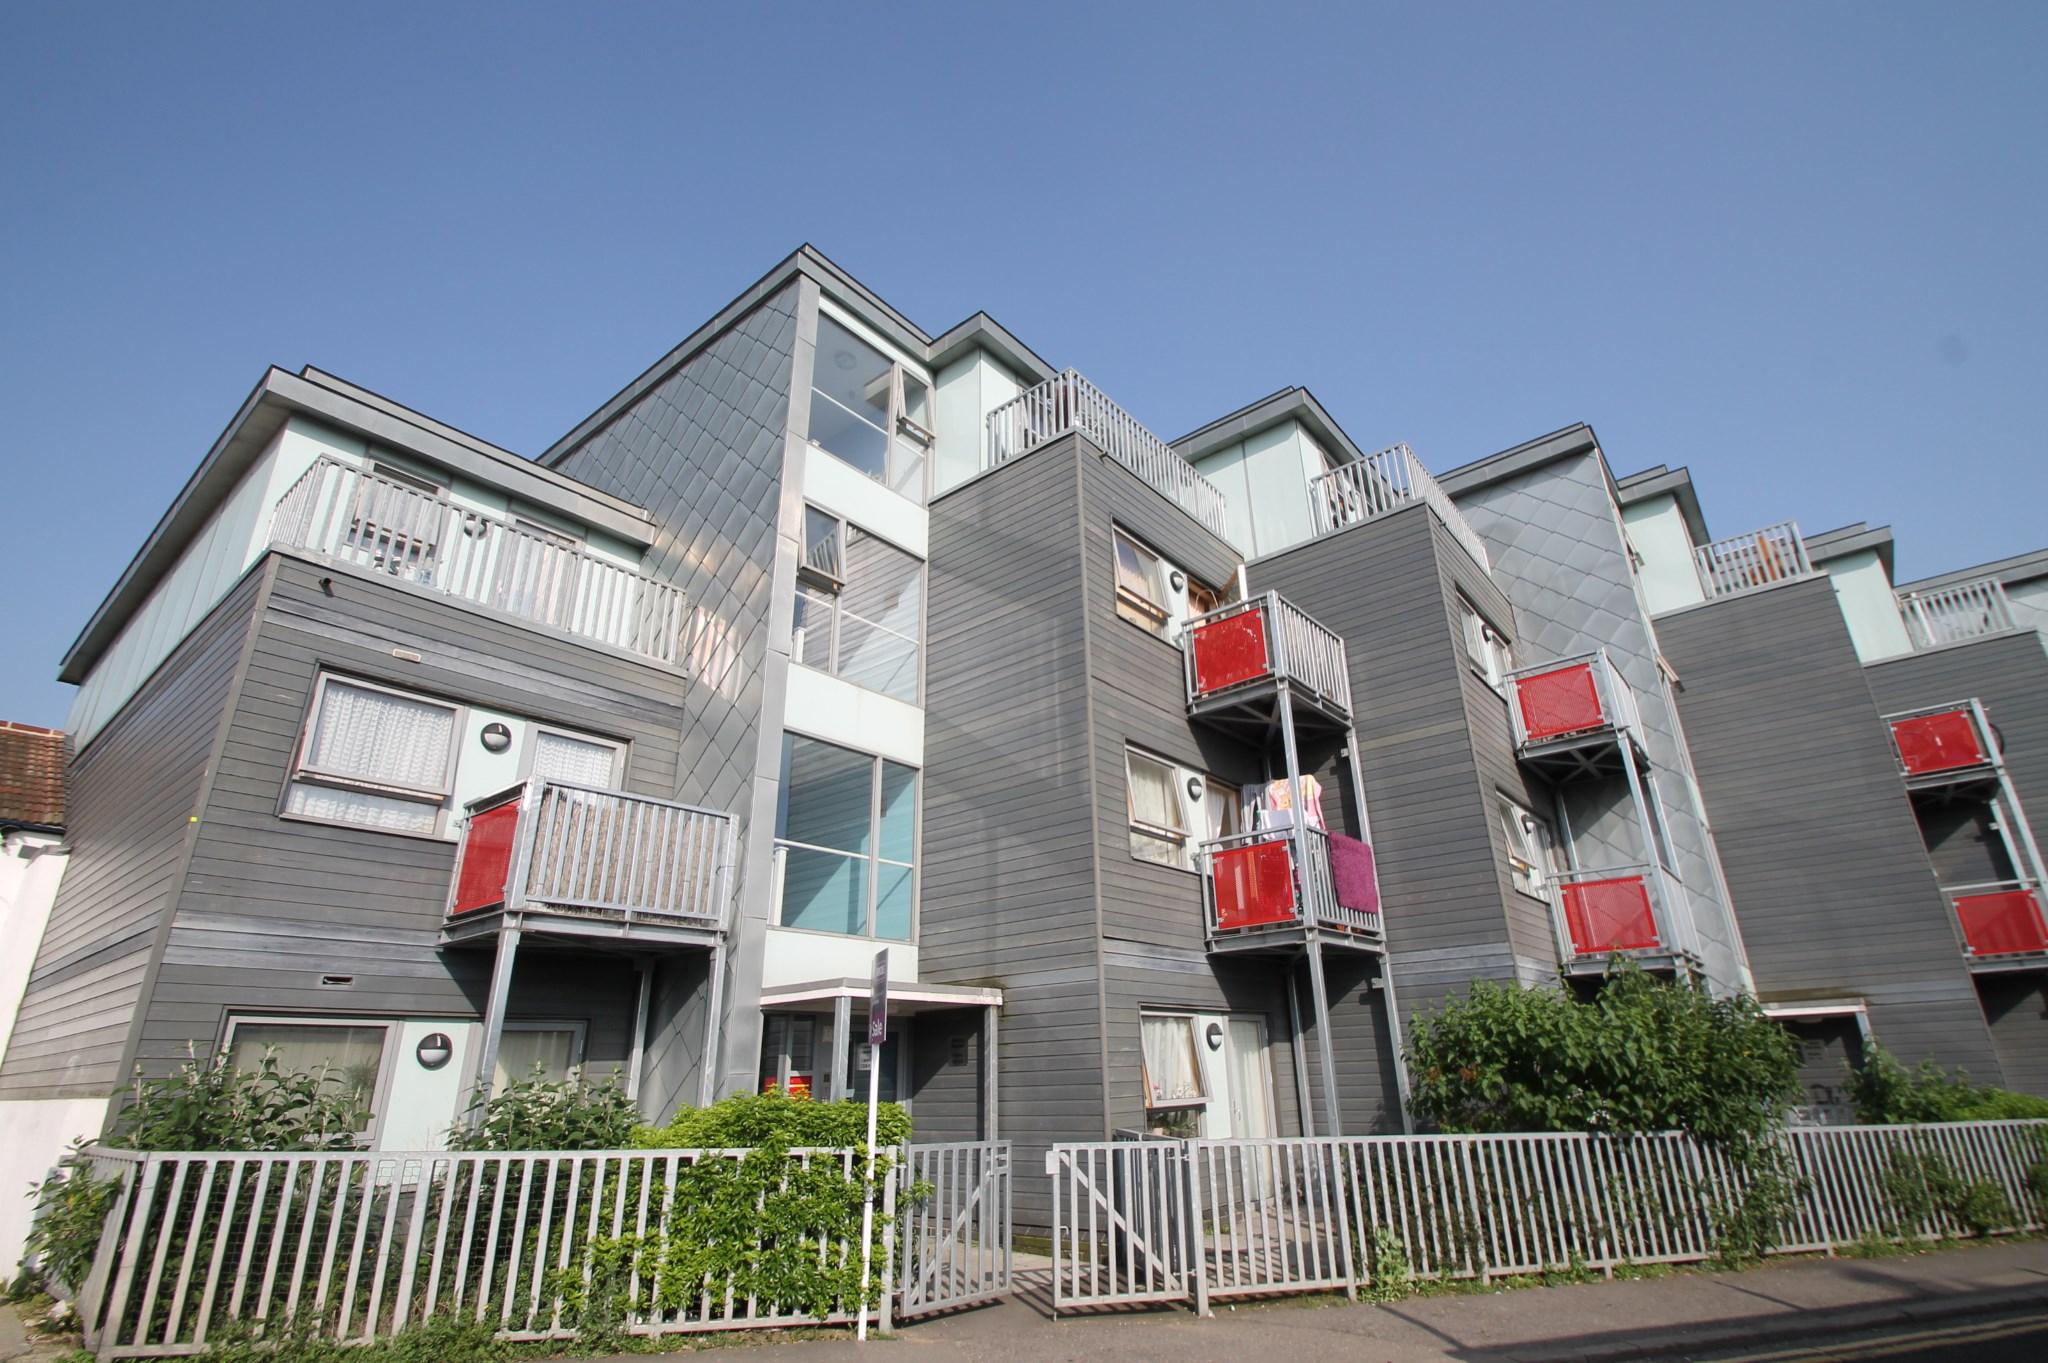 Baker House, 160 Handcroft Road, Croydon, CR0